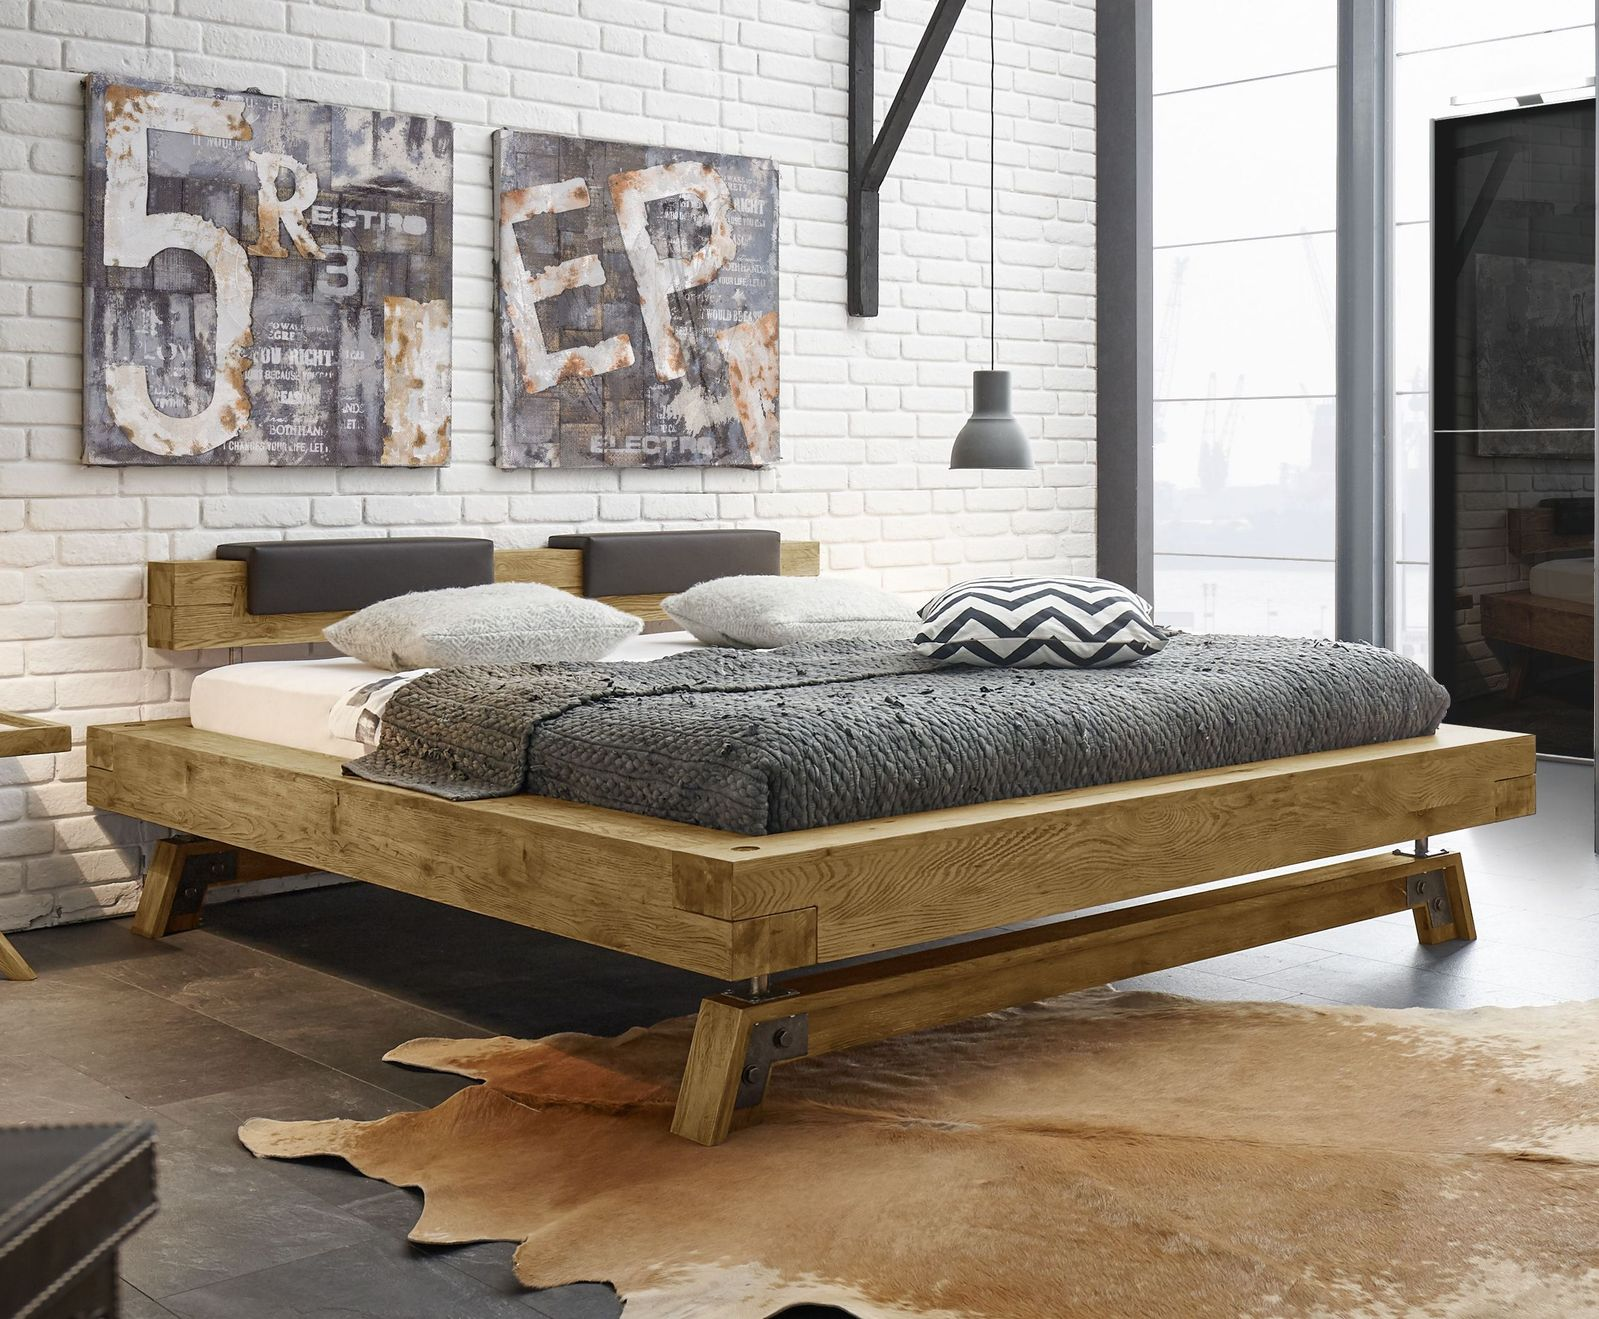 Full Size of Rustikal Bett Rustikales Kaufen Selber Bauen Rustikale Betten Massivholzbetten Gunstig Holzbetten Aus Wildeiche In Balkenoptik Mit Holzkufen Valdivia Ohne Bett Rustikales Bett